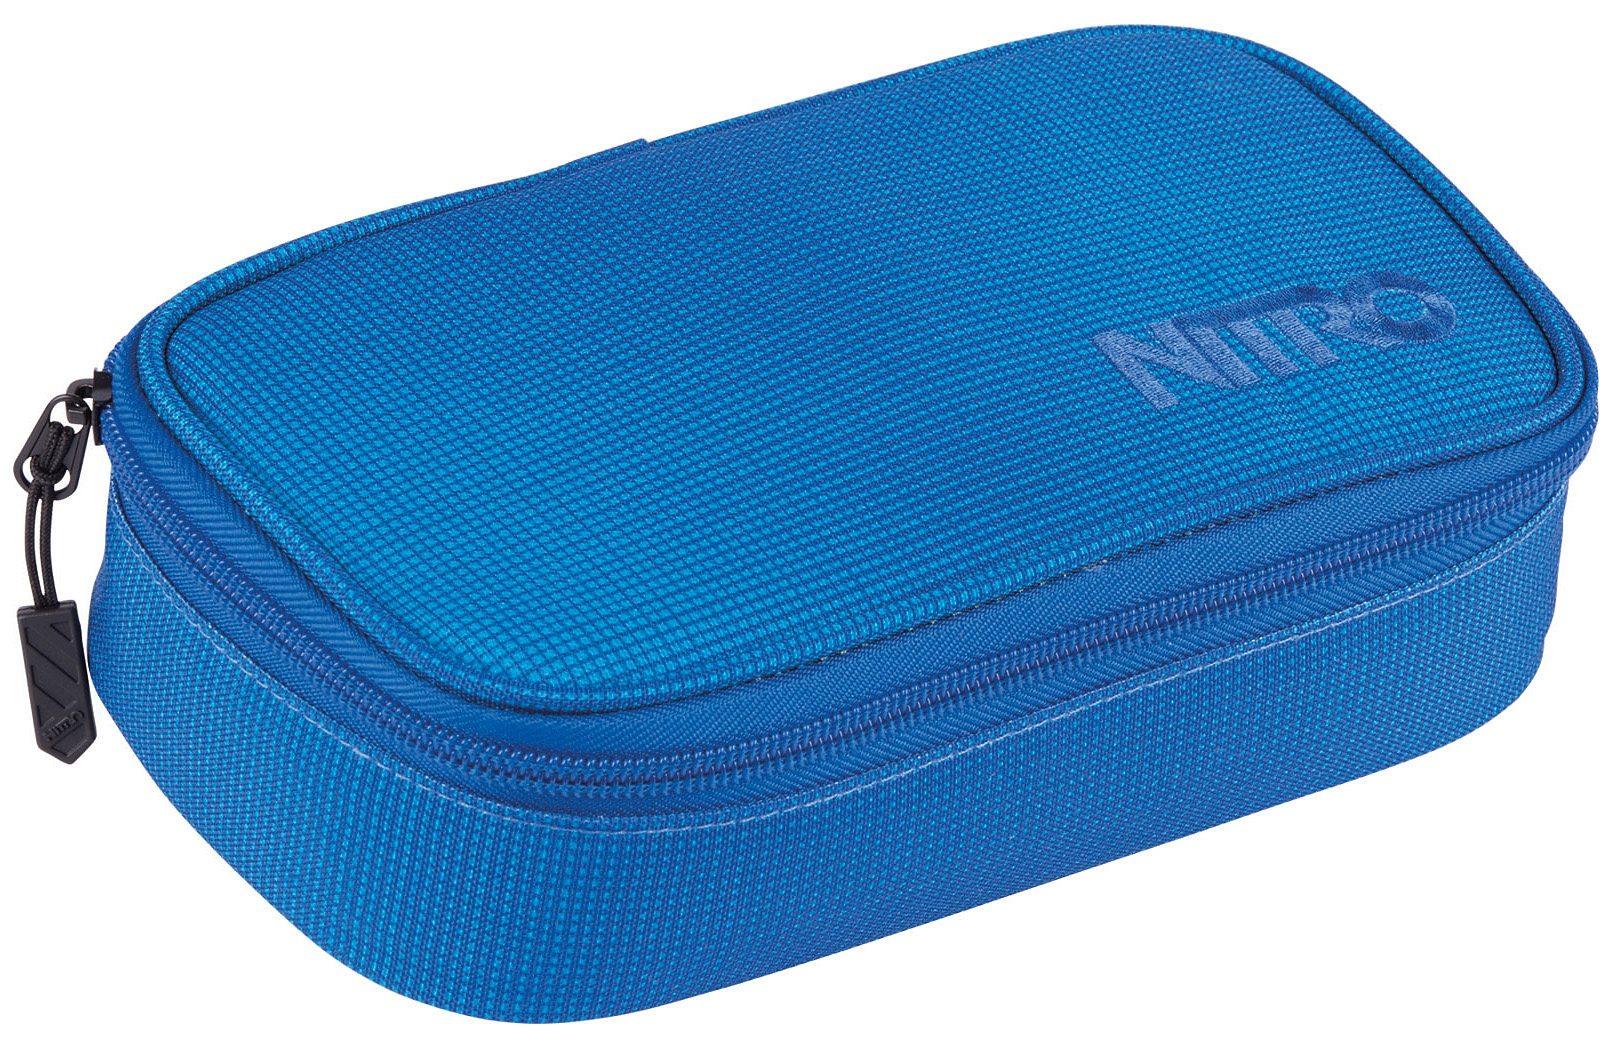 Nitro Federmäppchen, »Pencil Case XL - blur brilliants blue«